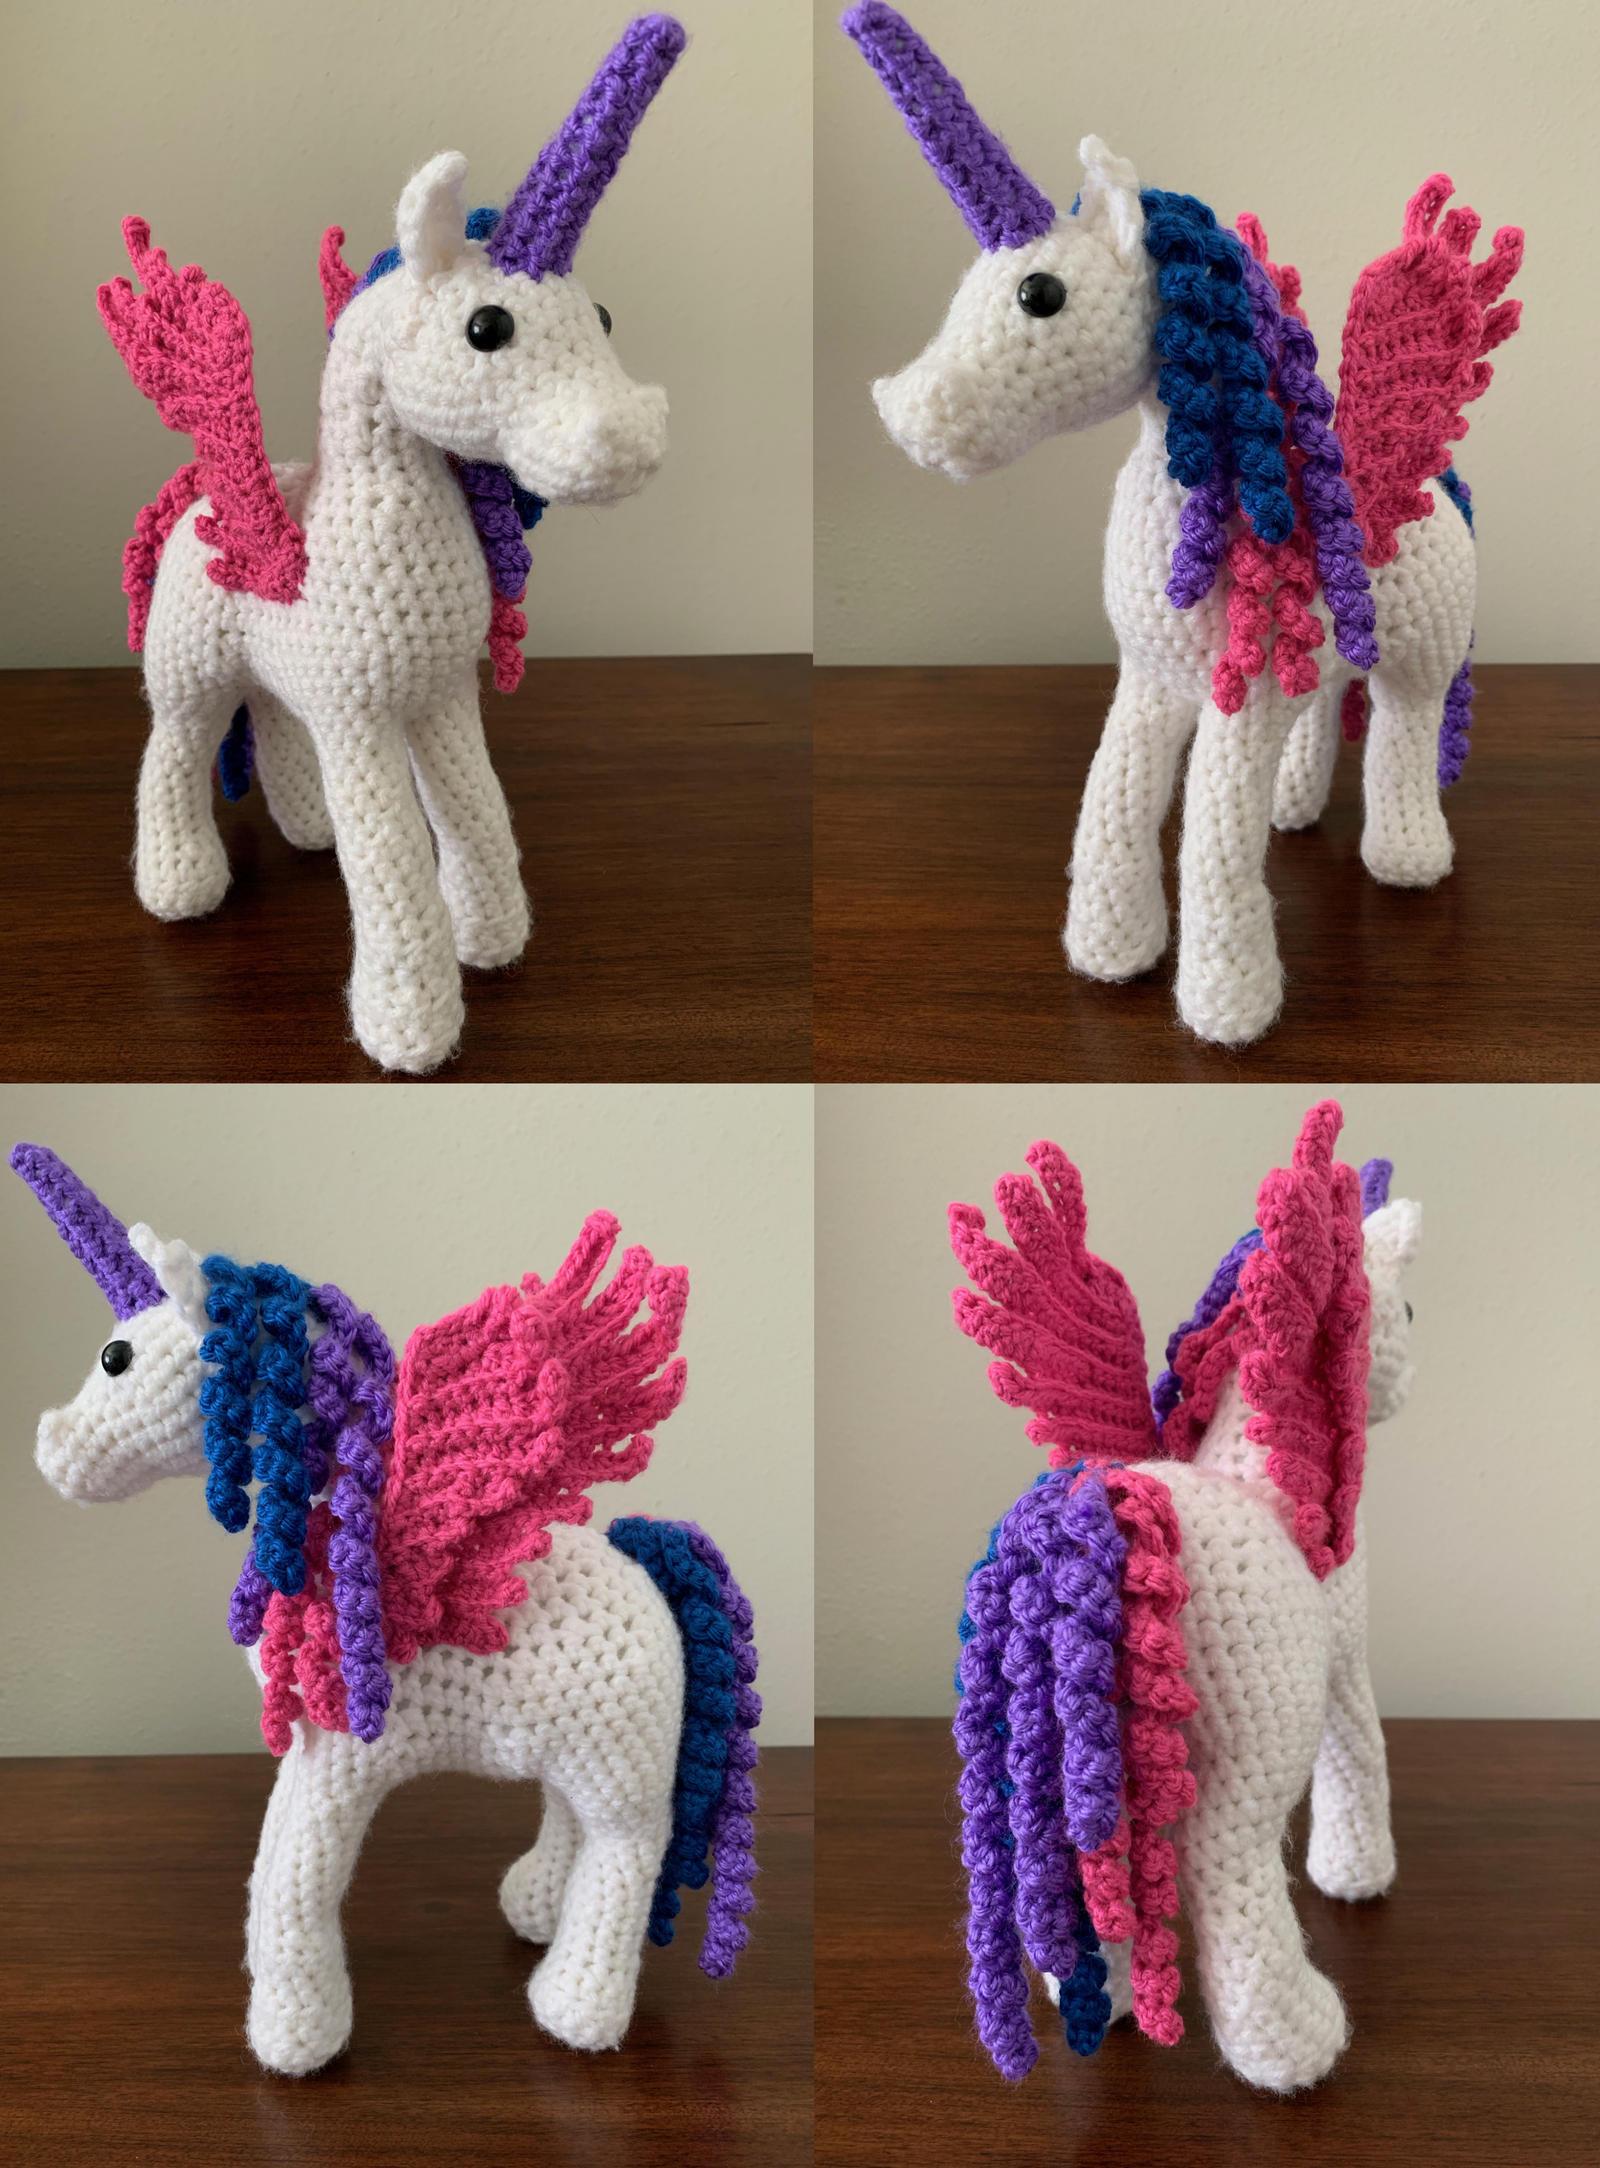 Rainbow pony amigurumi pattern | Amigurumi, Crochet toys patterns ... | 2168x1600